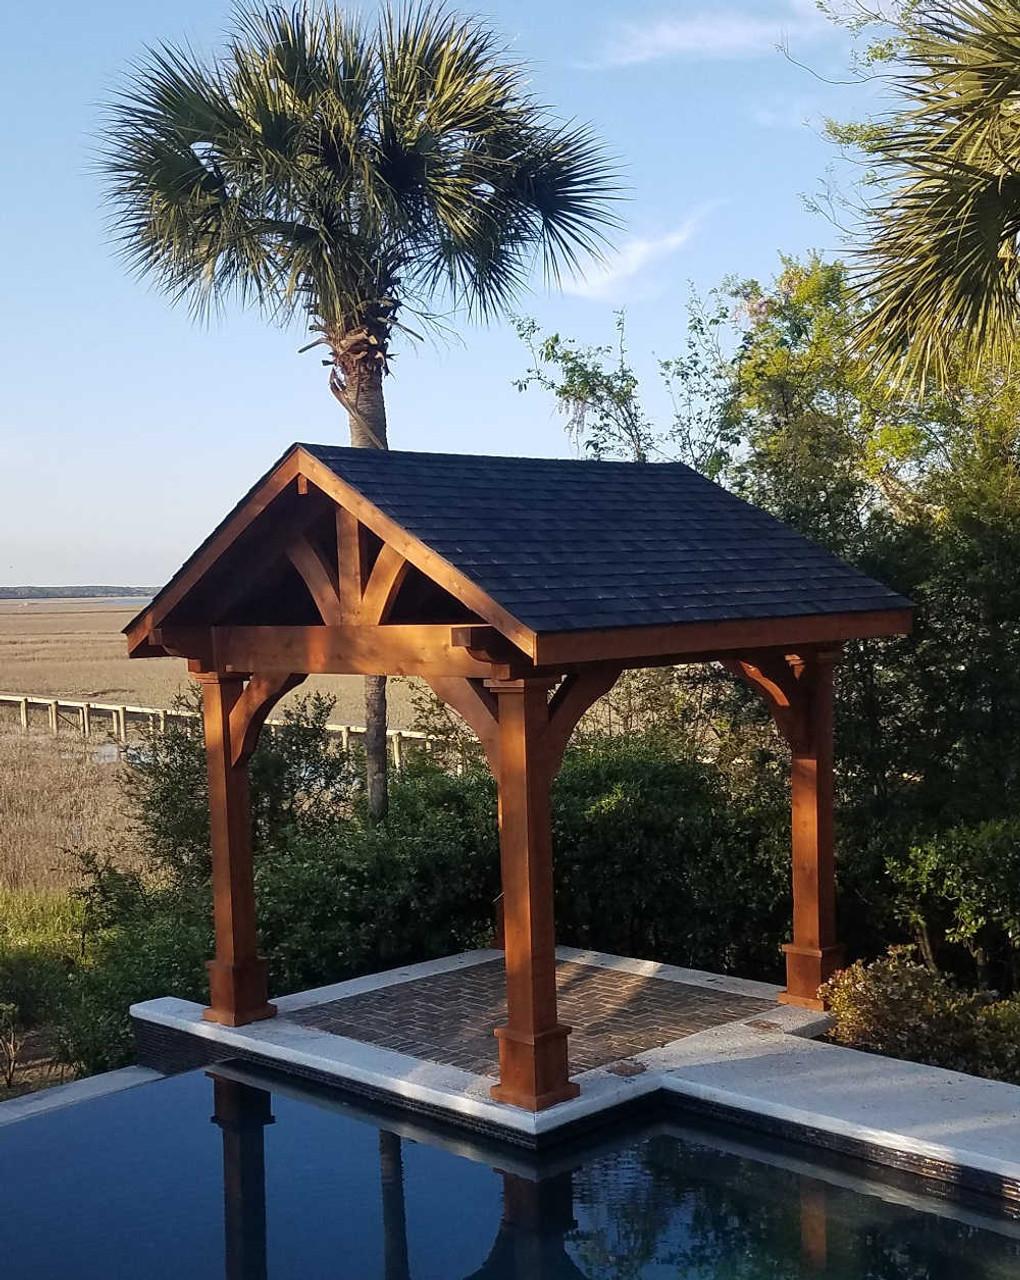 10x10 Grand Cedar Pavilion Kit, Sullivan's Island, South Carolina